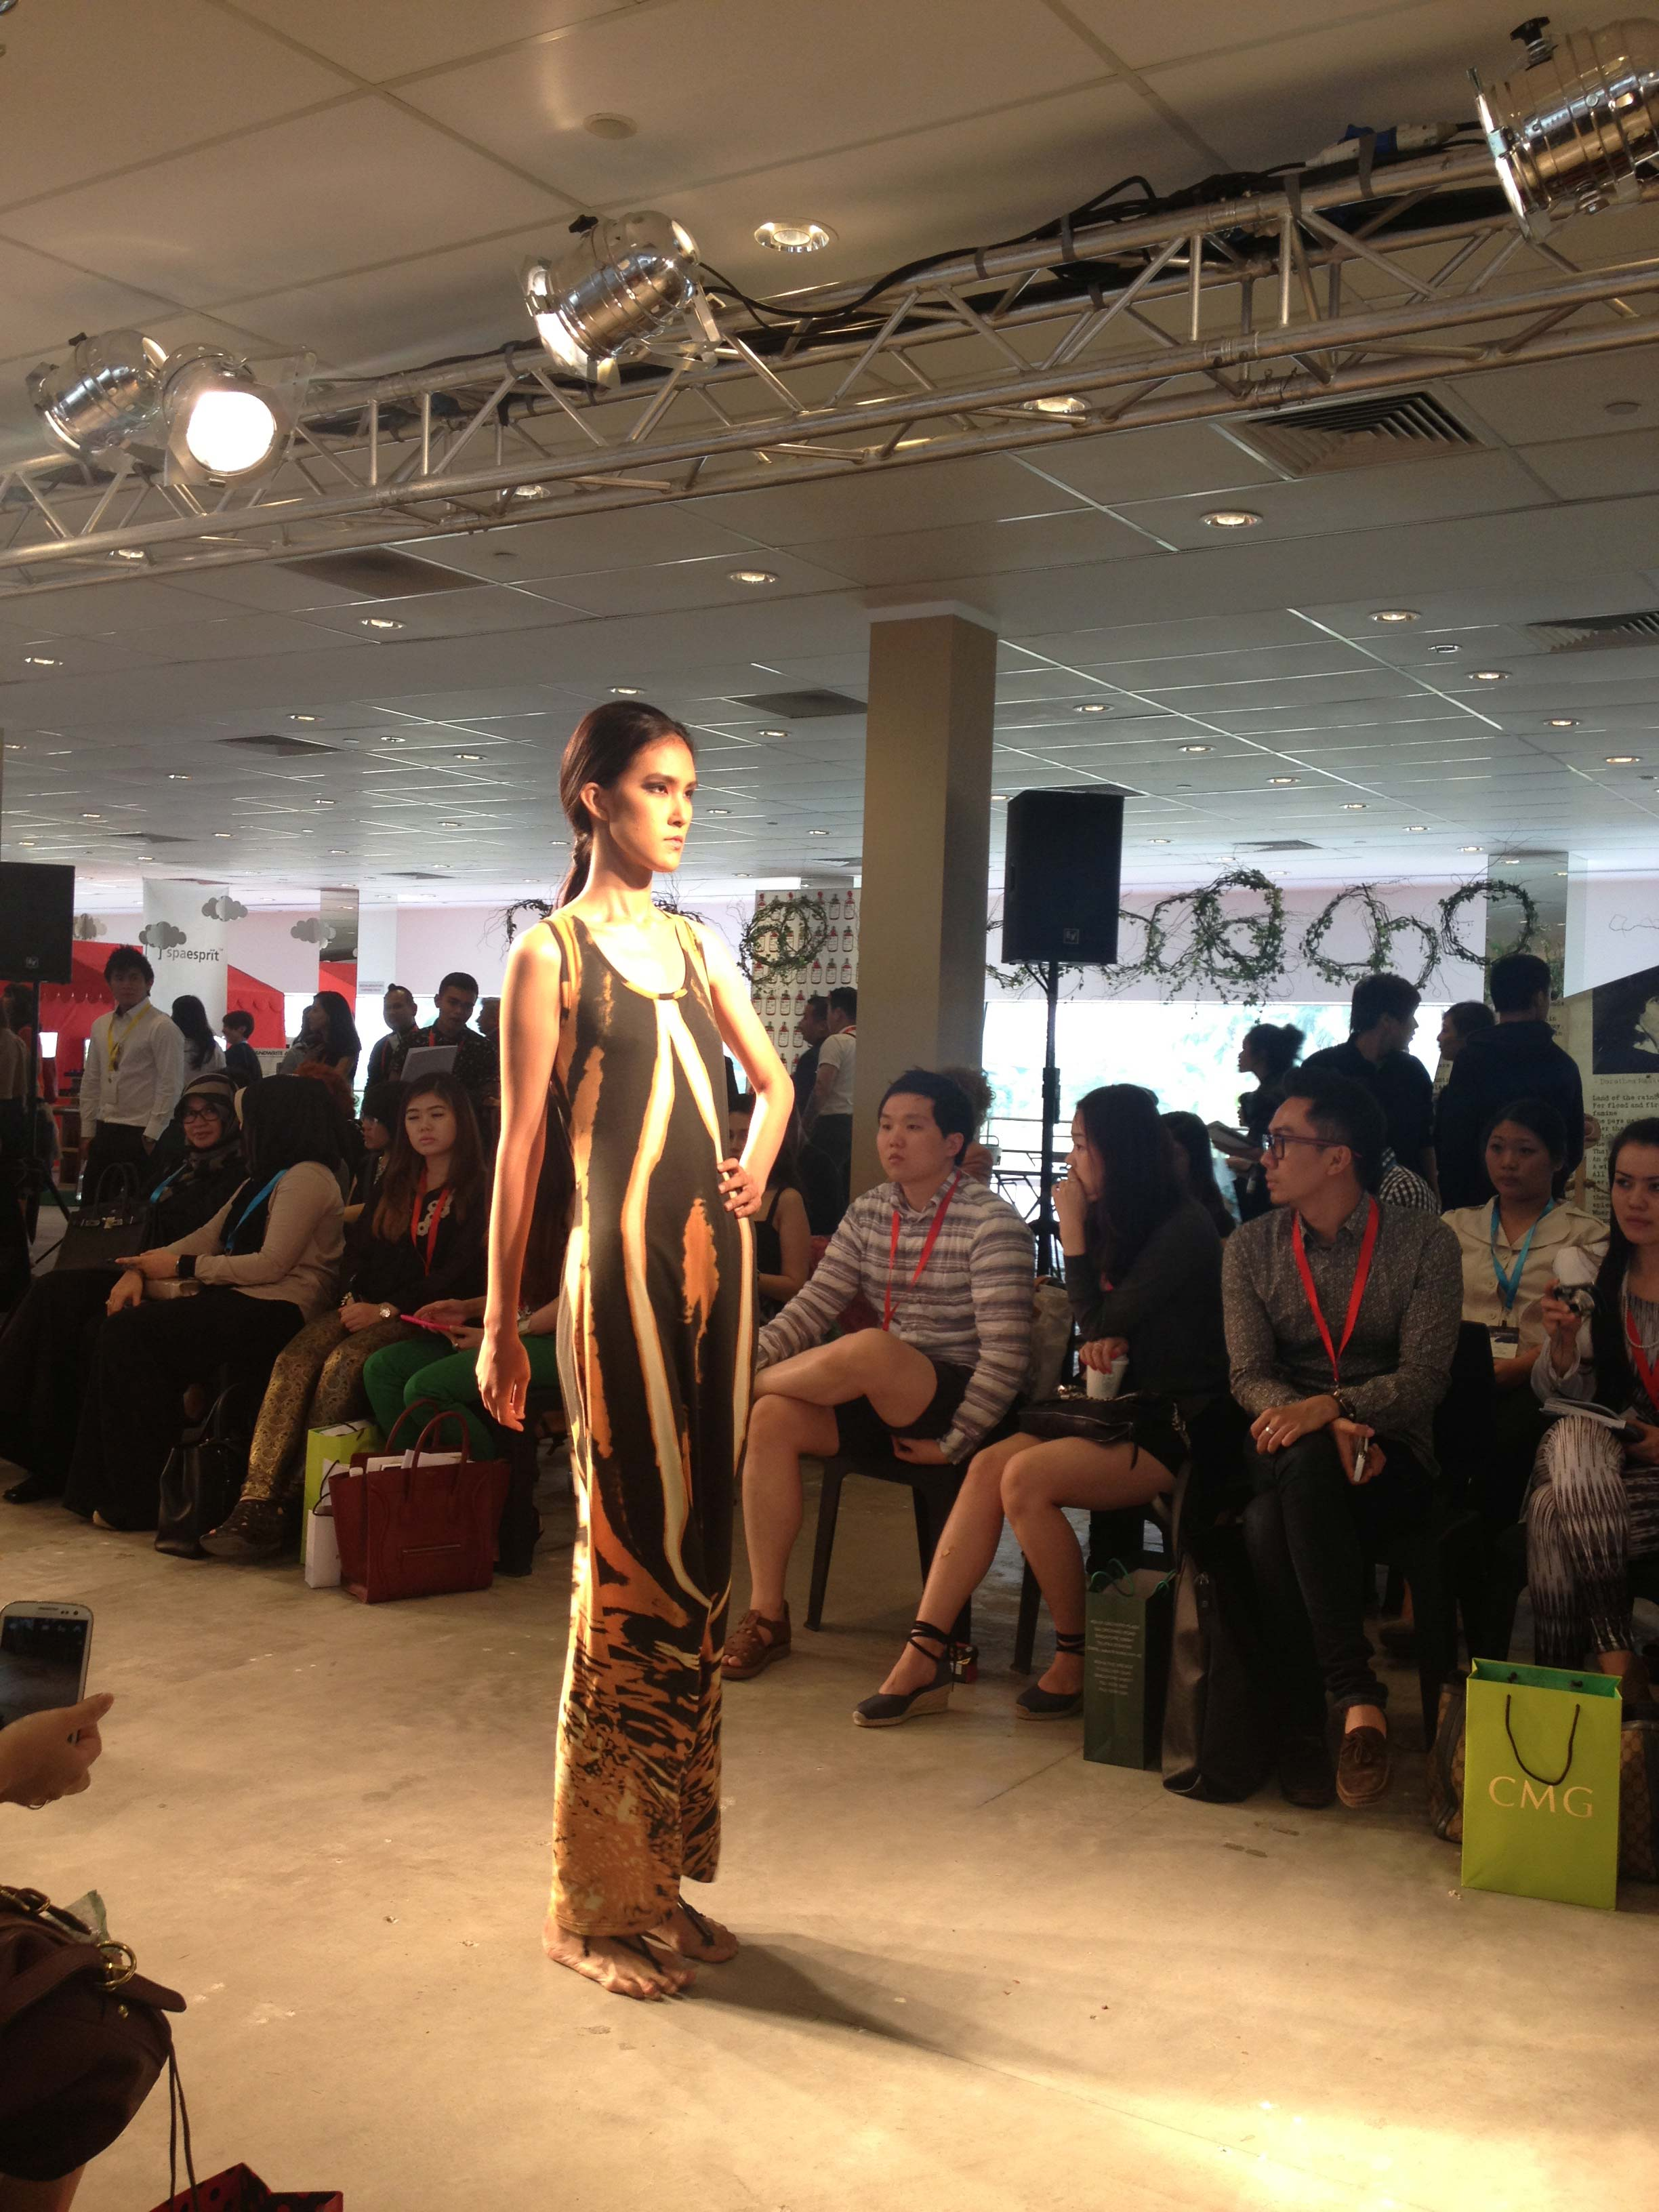 Tribu Sauvage makes its runway debut at BLUEPRINT during Singapore's fashion week, Asia Fashion Exchange (AFX). Fertility tank dress.